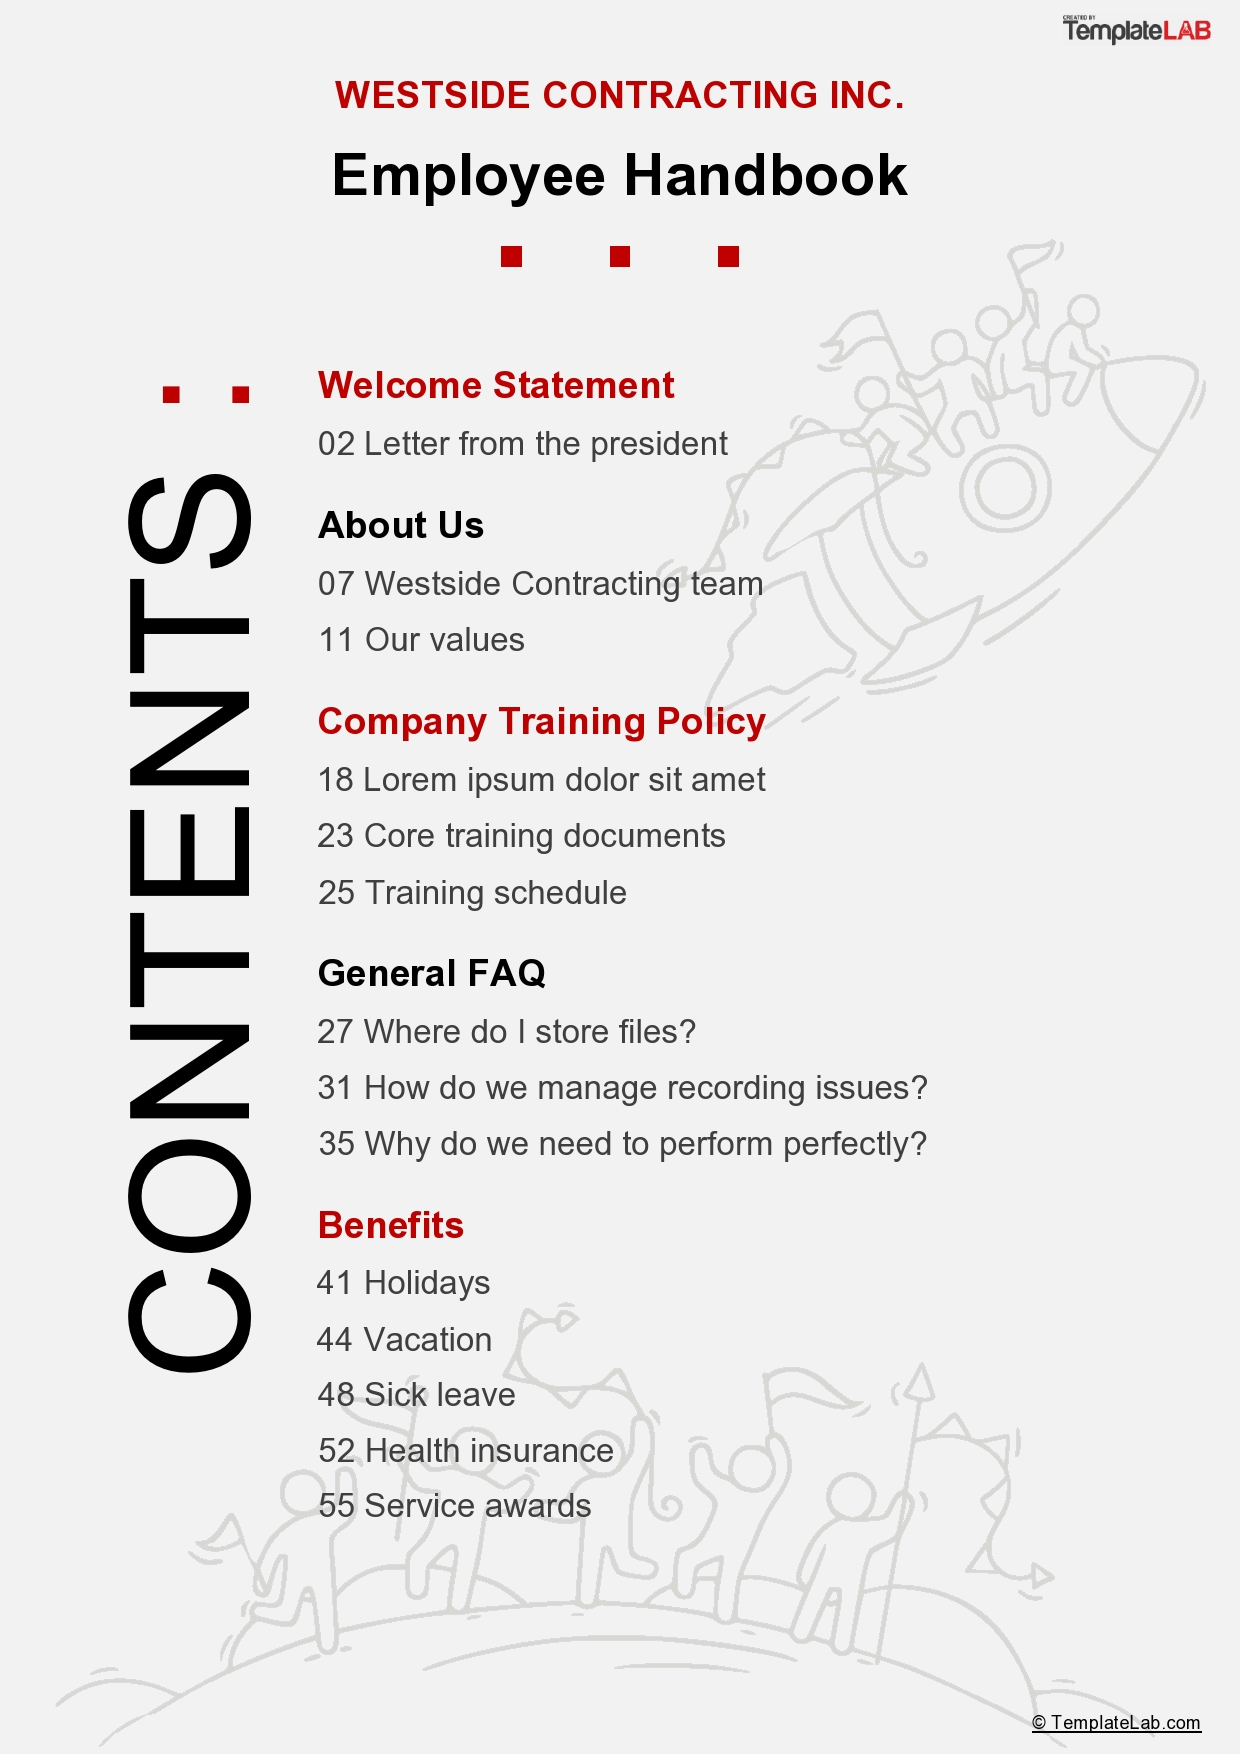 Free Employee Handbook Table of Contents - TemplateLab.com